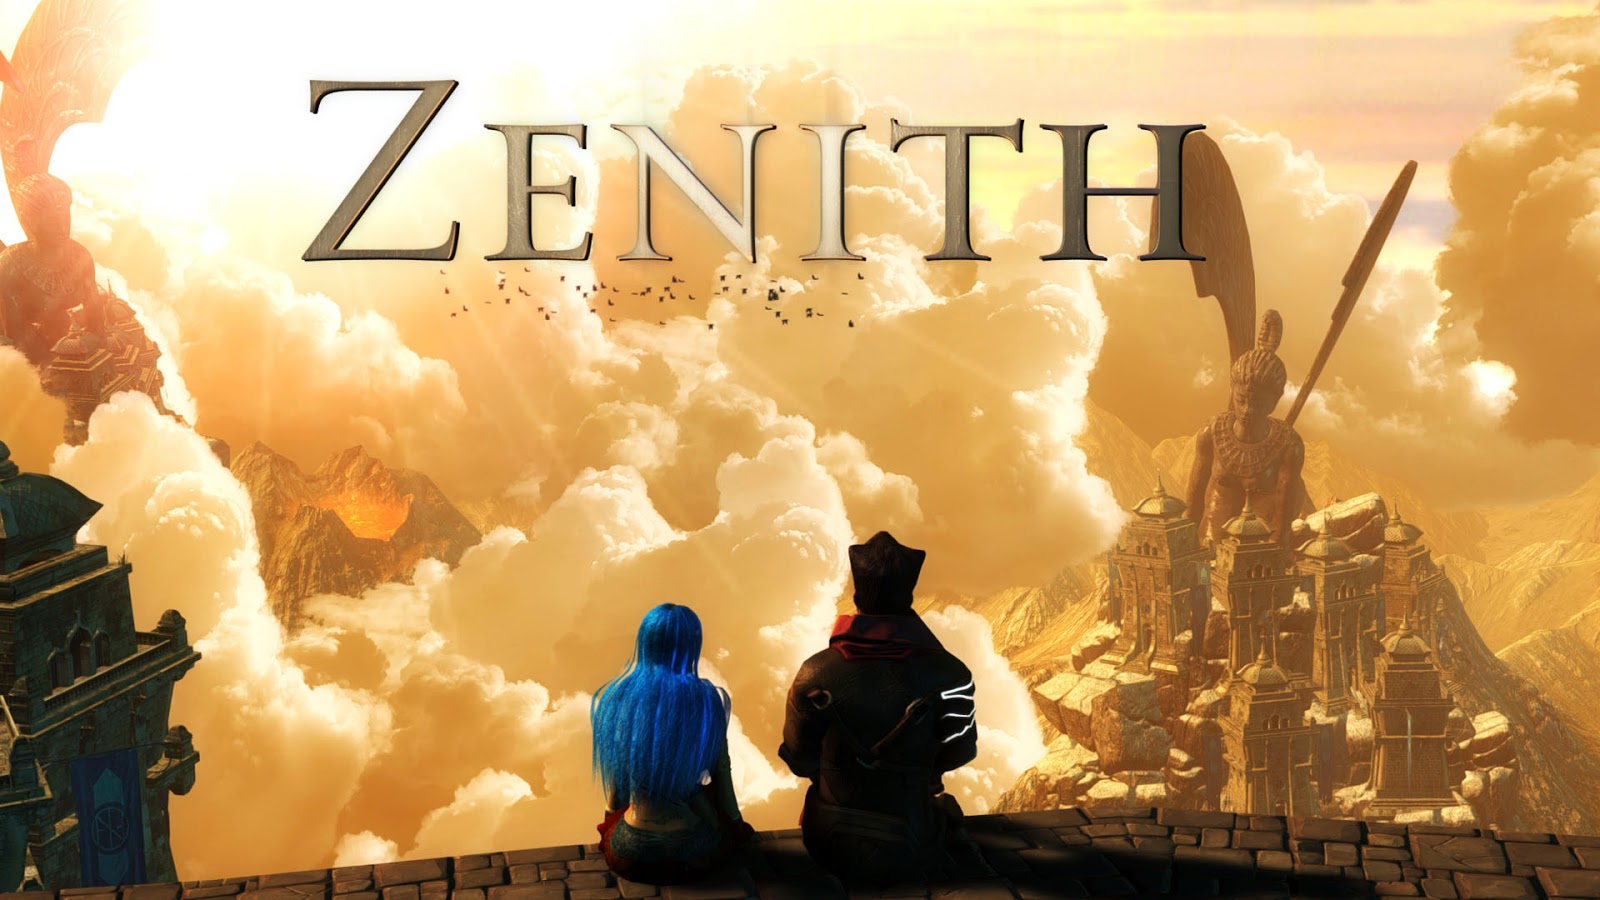 The sad story of Zenith